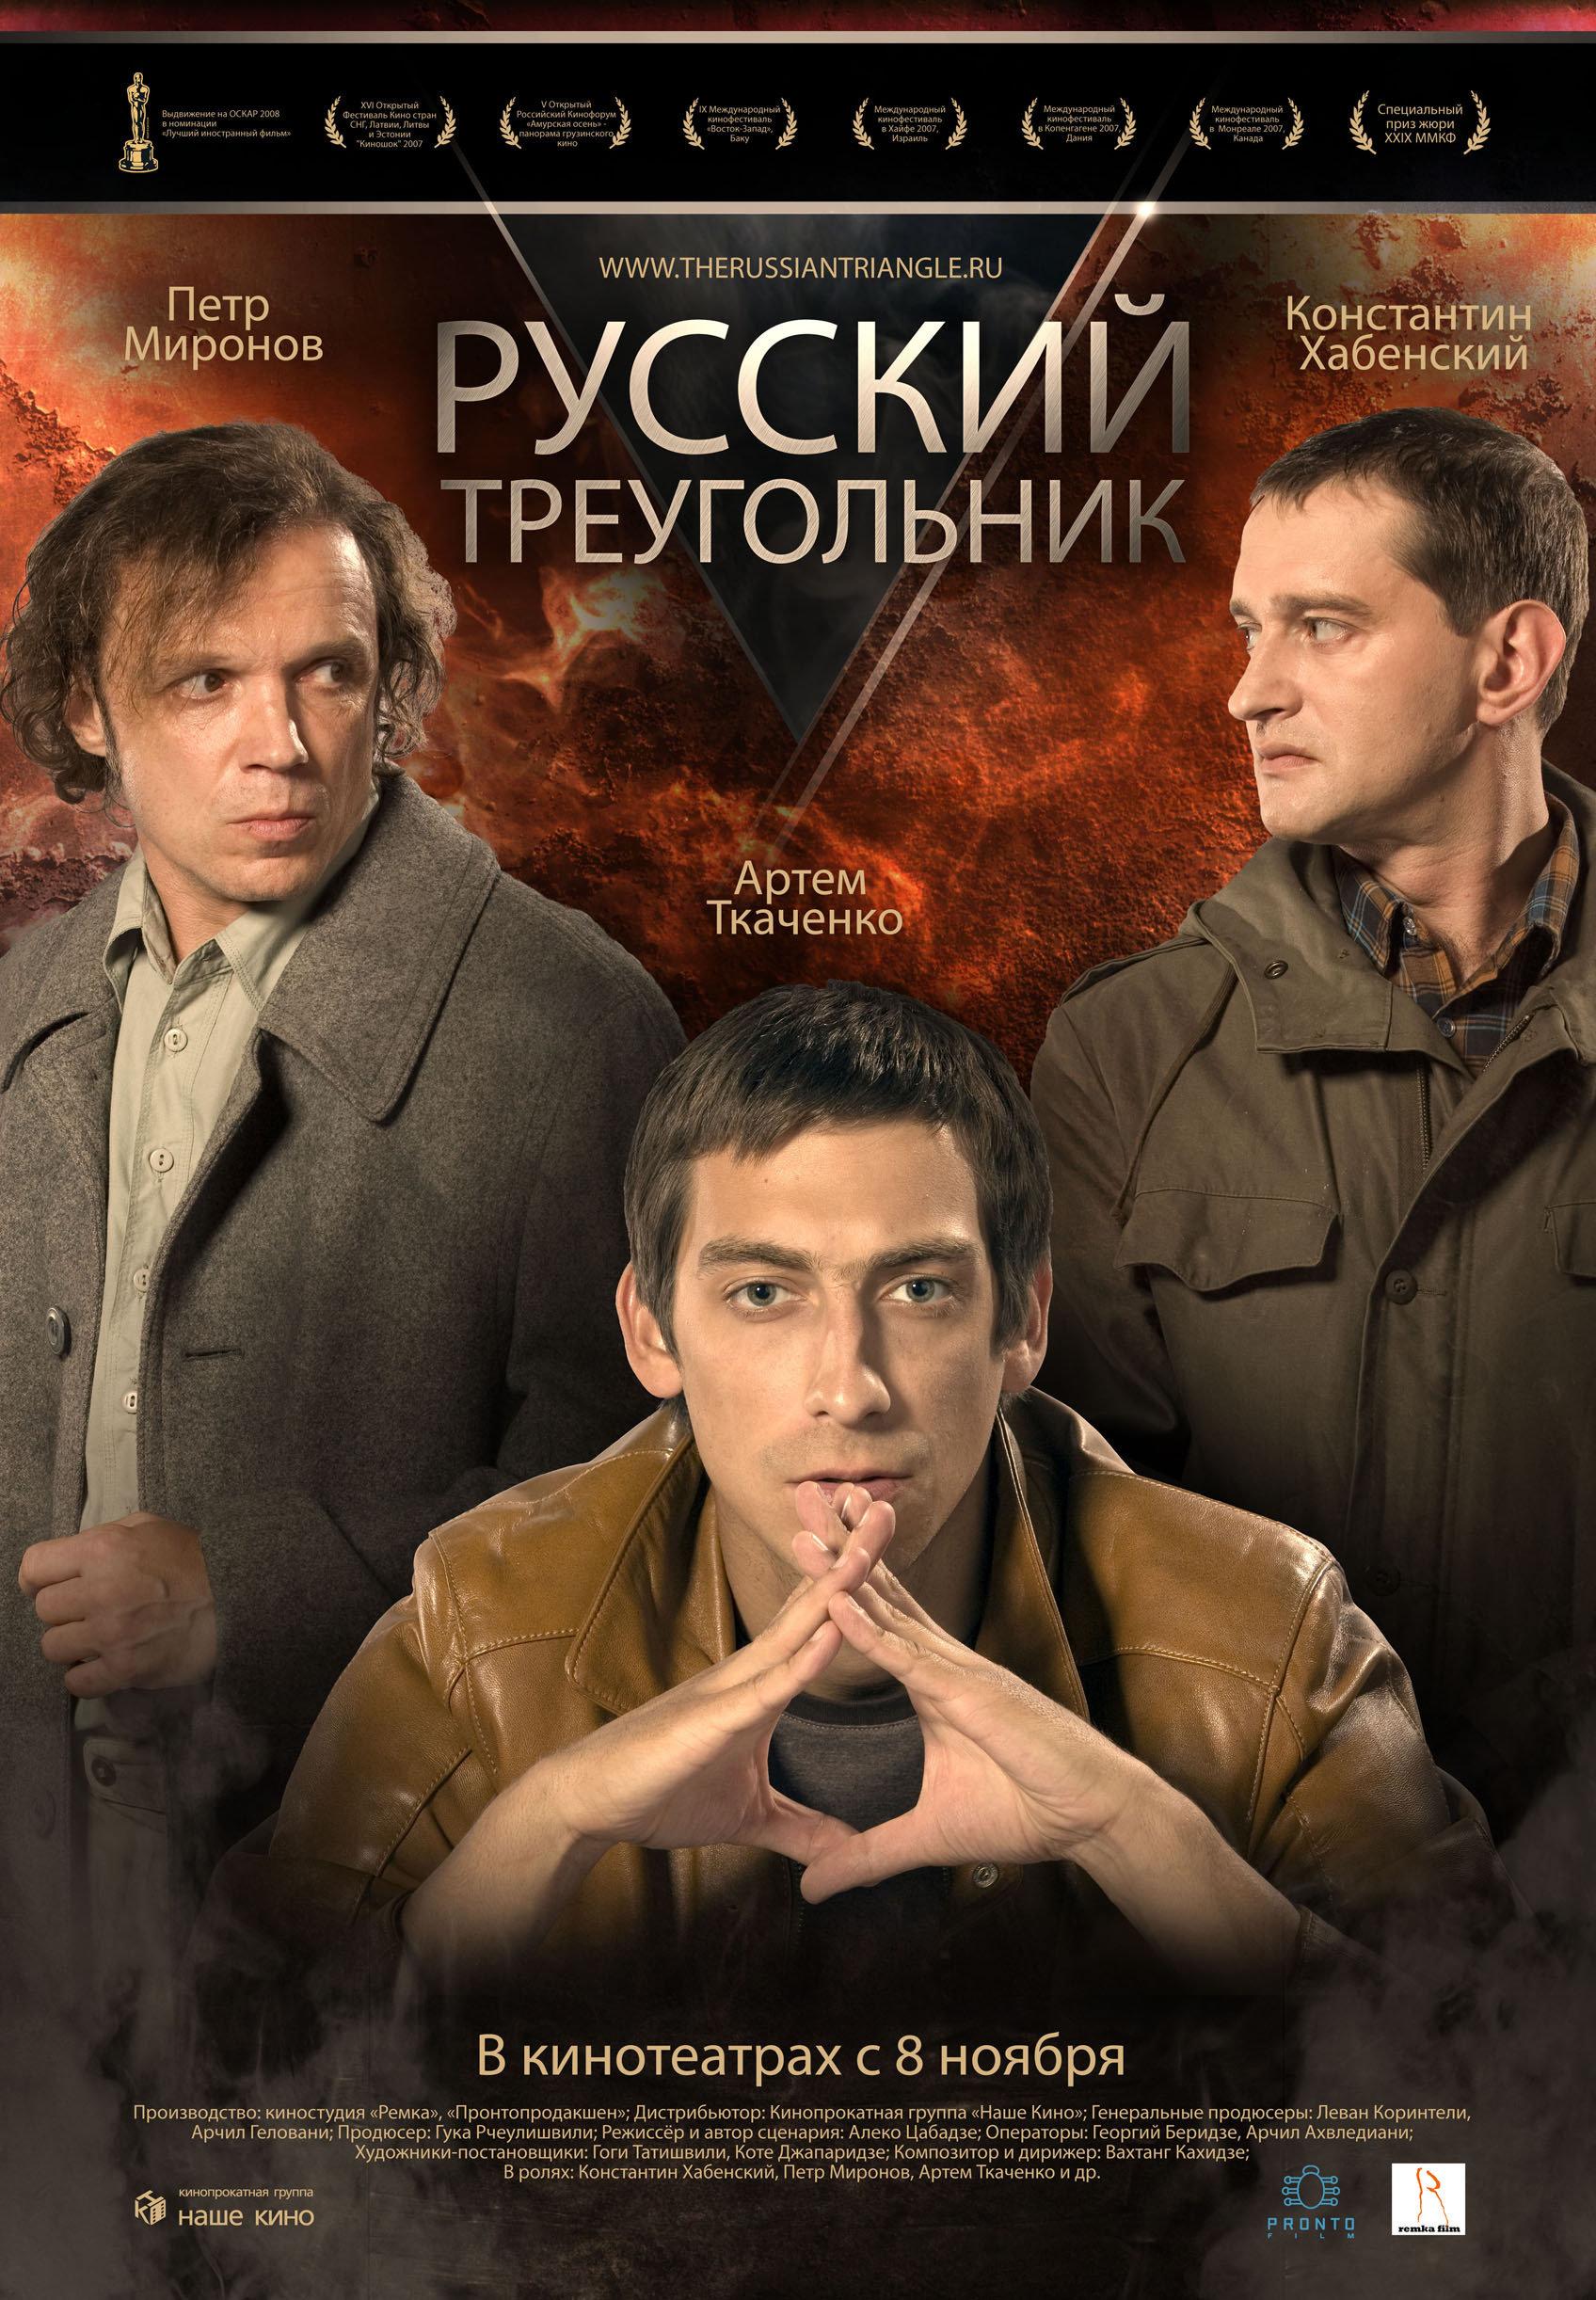 Actor Artem Tkachenko: biography, film career and personal life